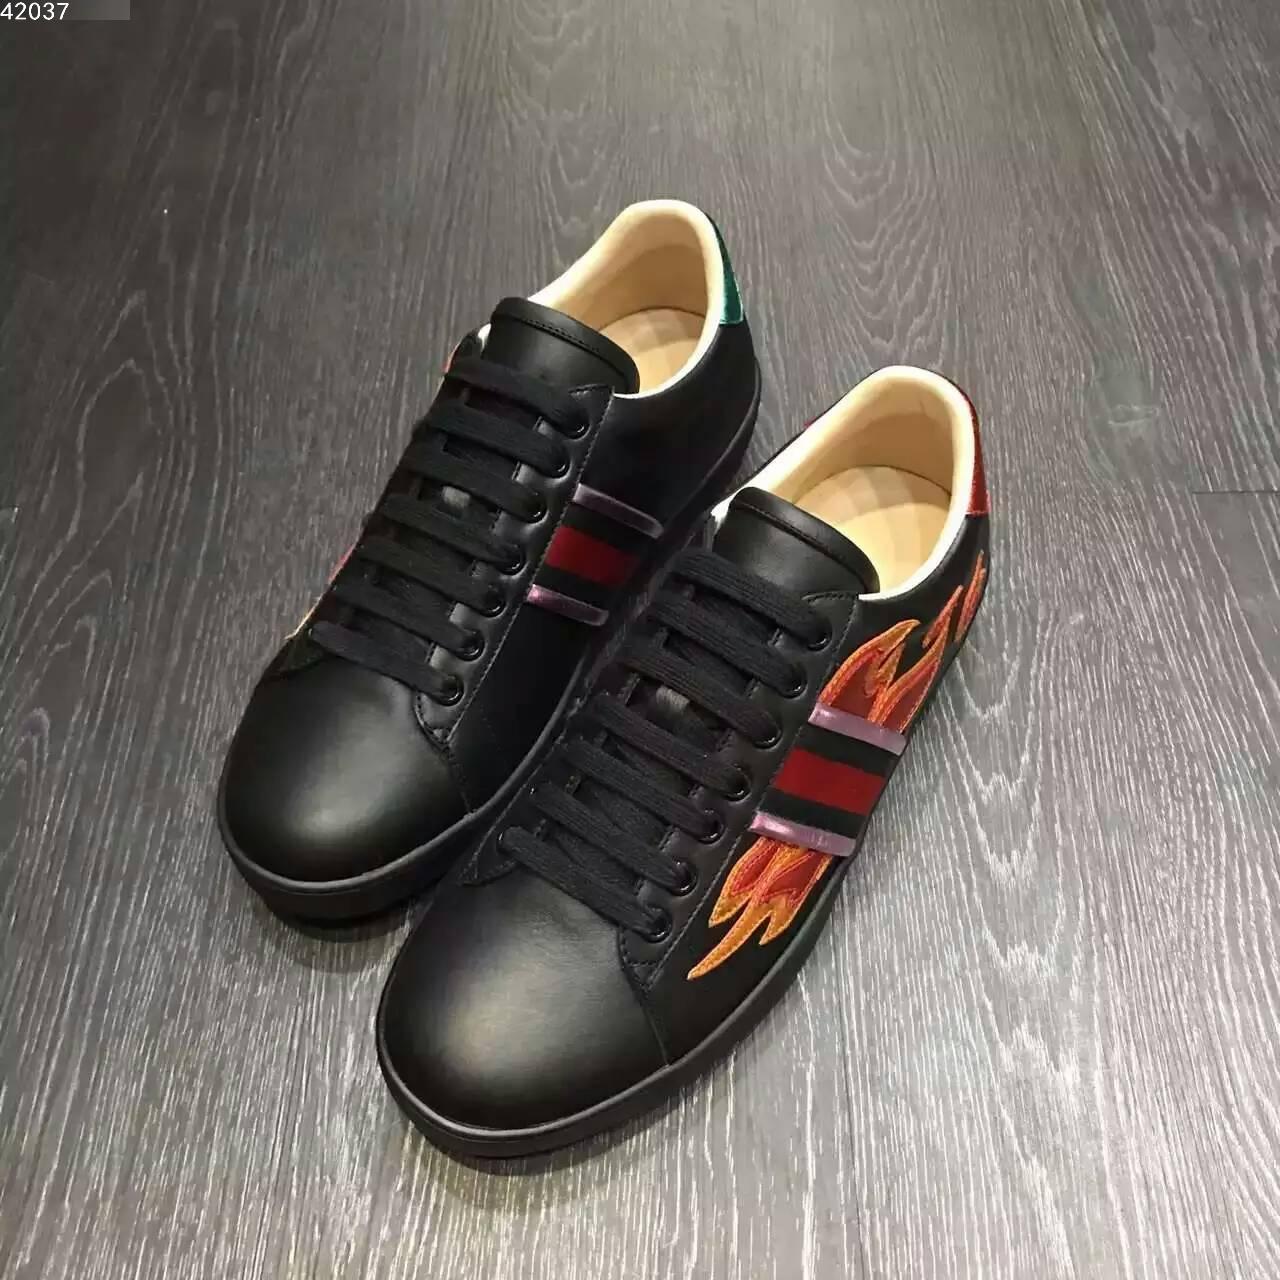 GUCCI 顶级男士休闲鞋2016专柜同步款